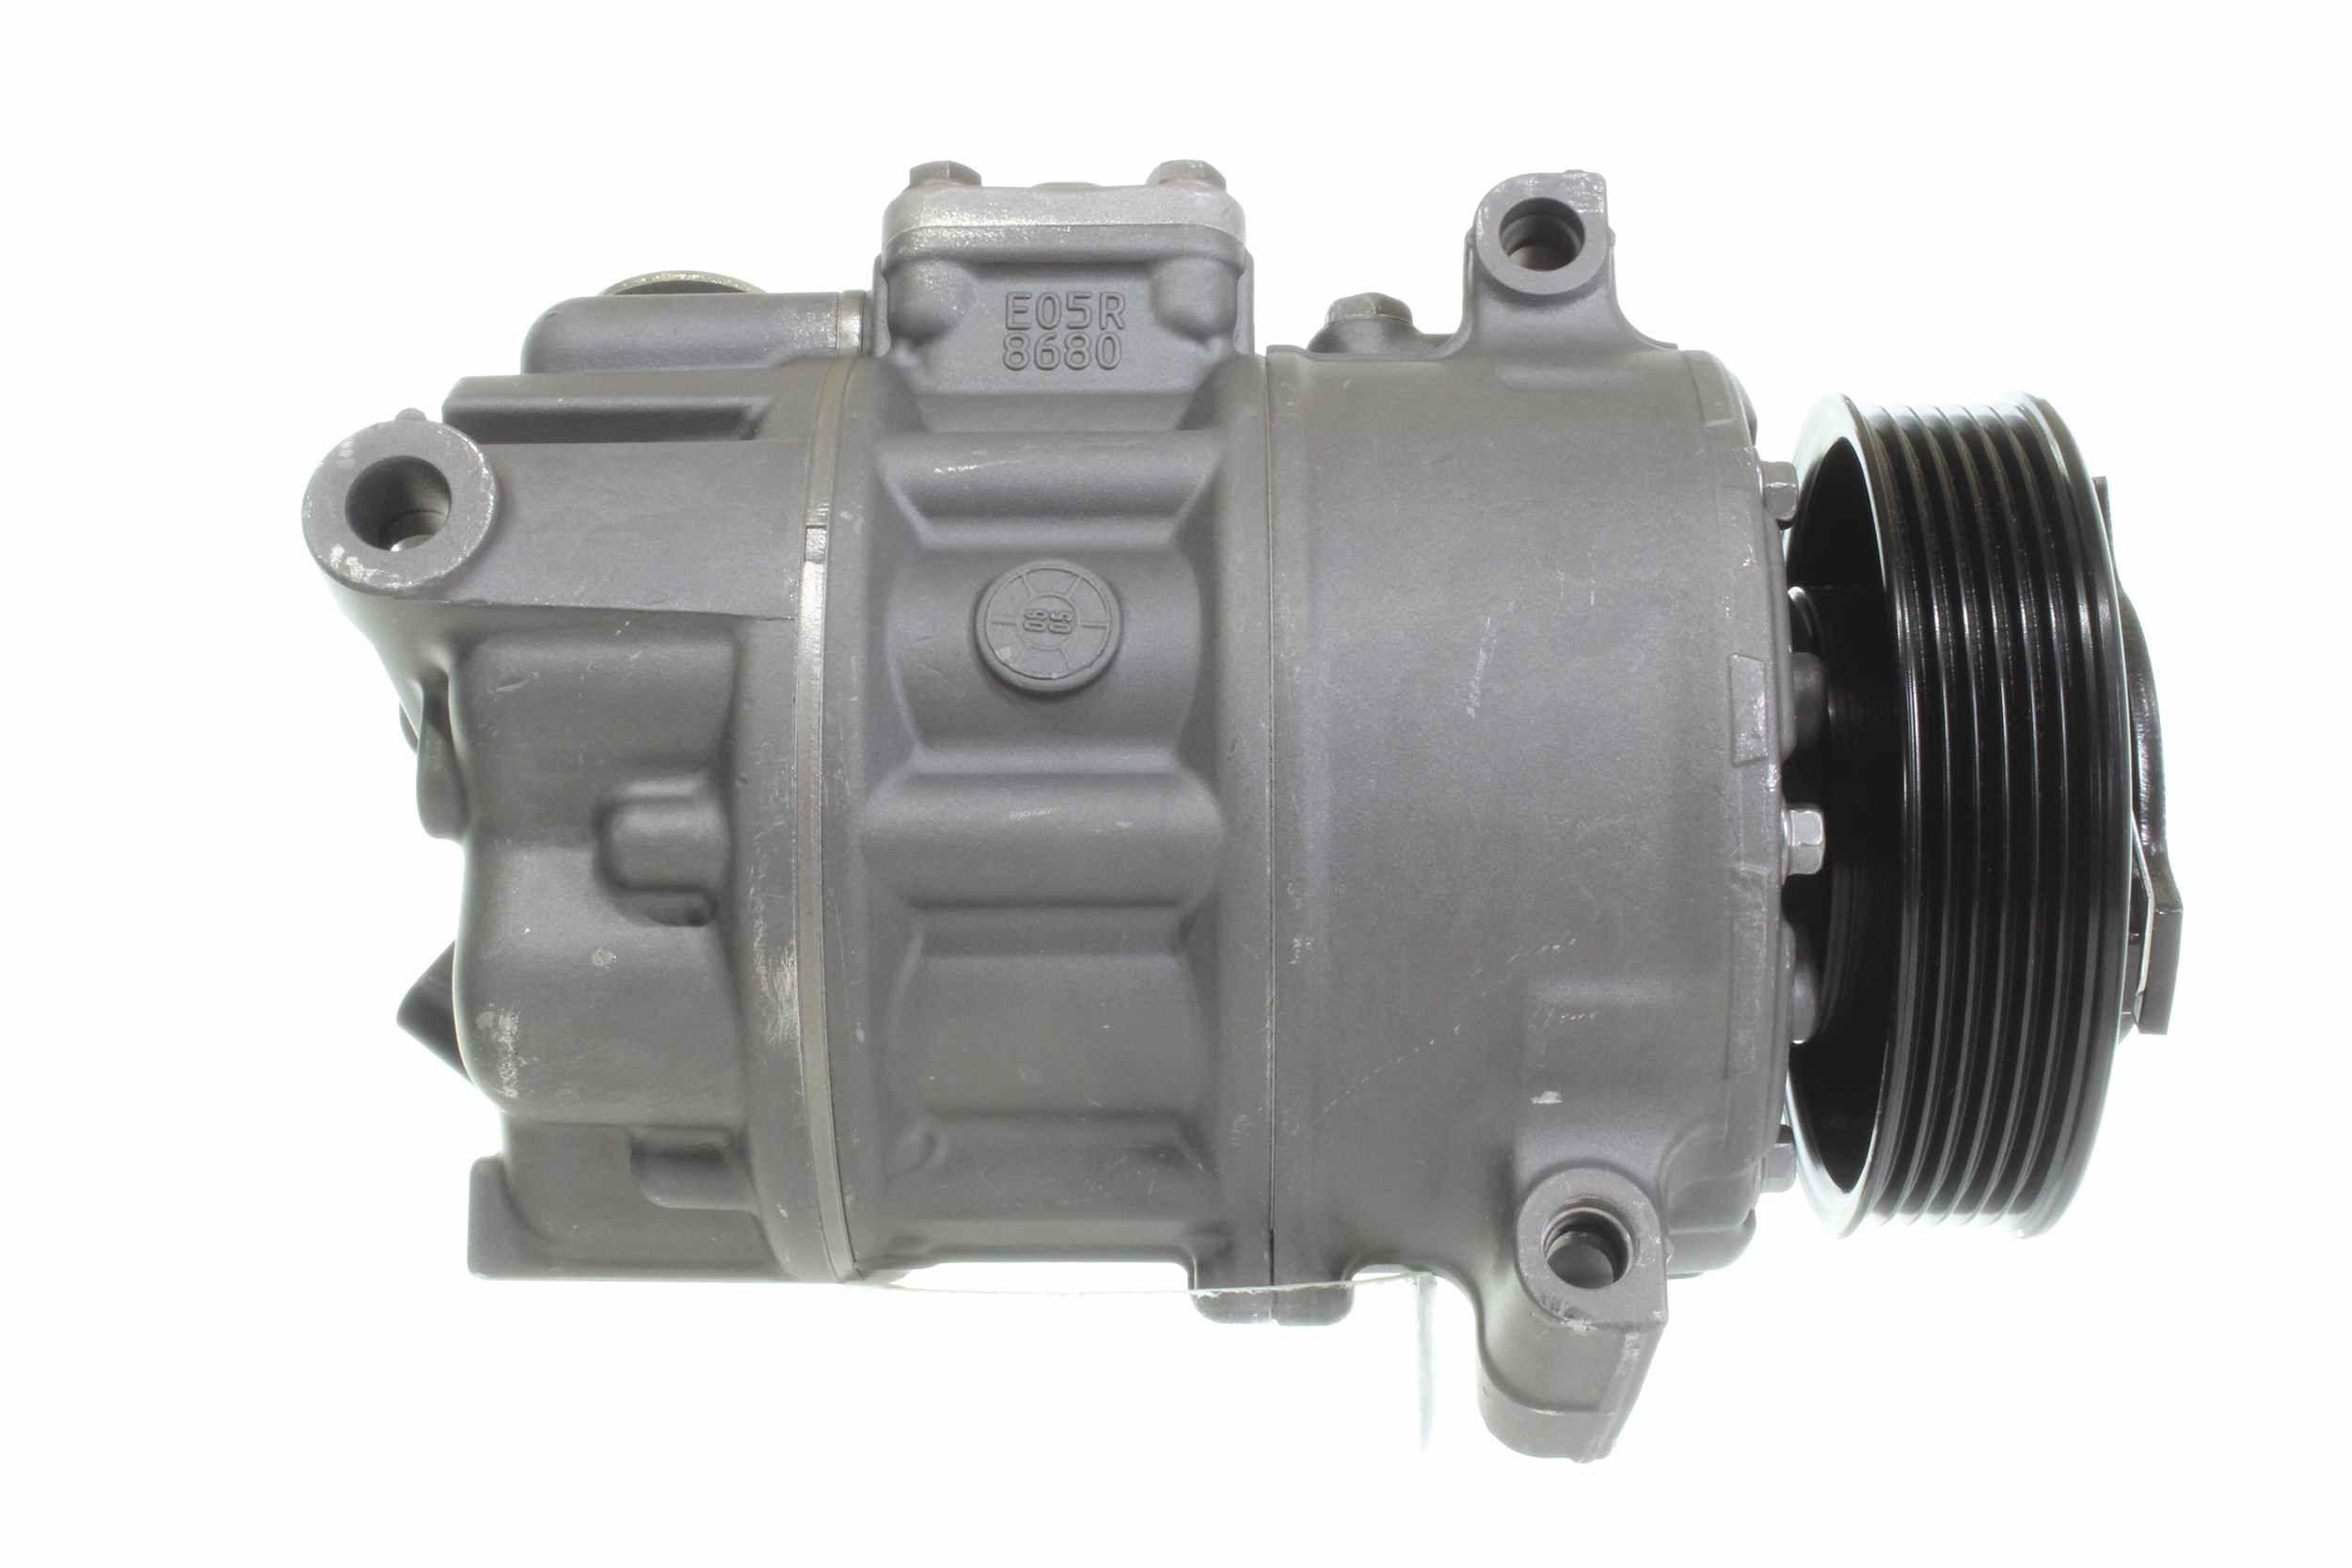 10550442 Klimaanlage Kompressor ALANKO - Markenprodukte billig